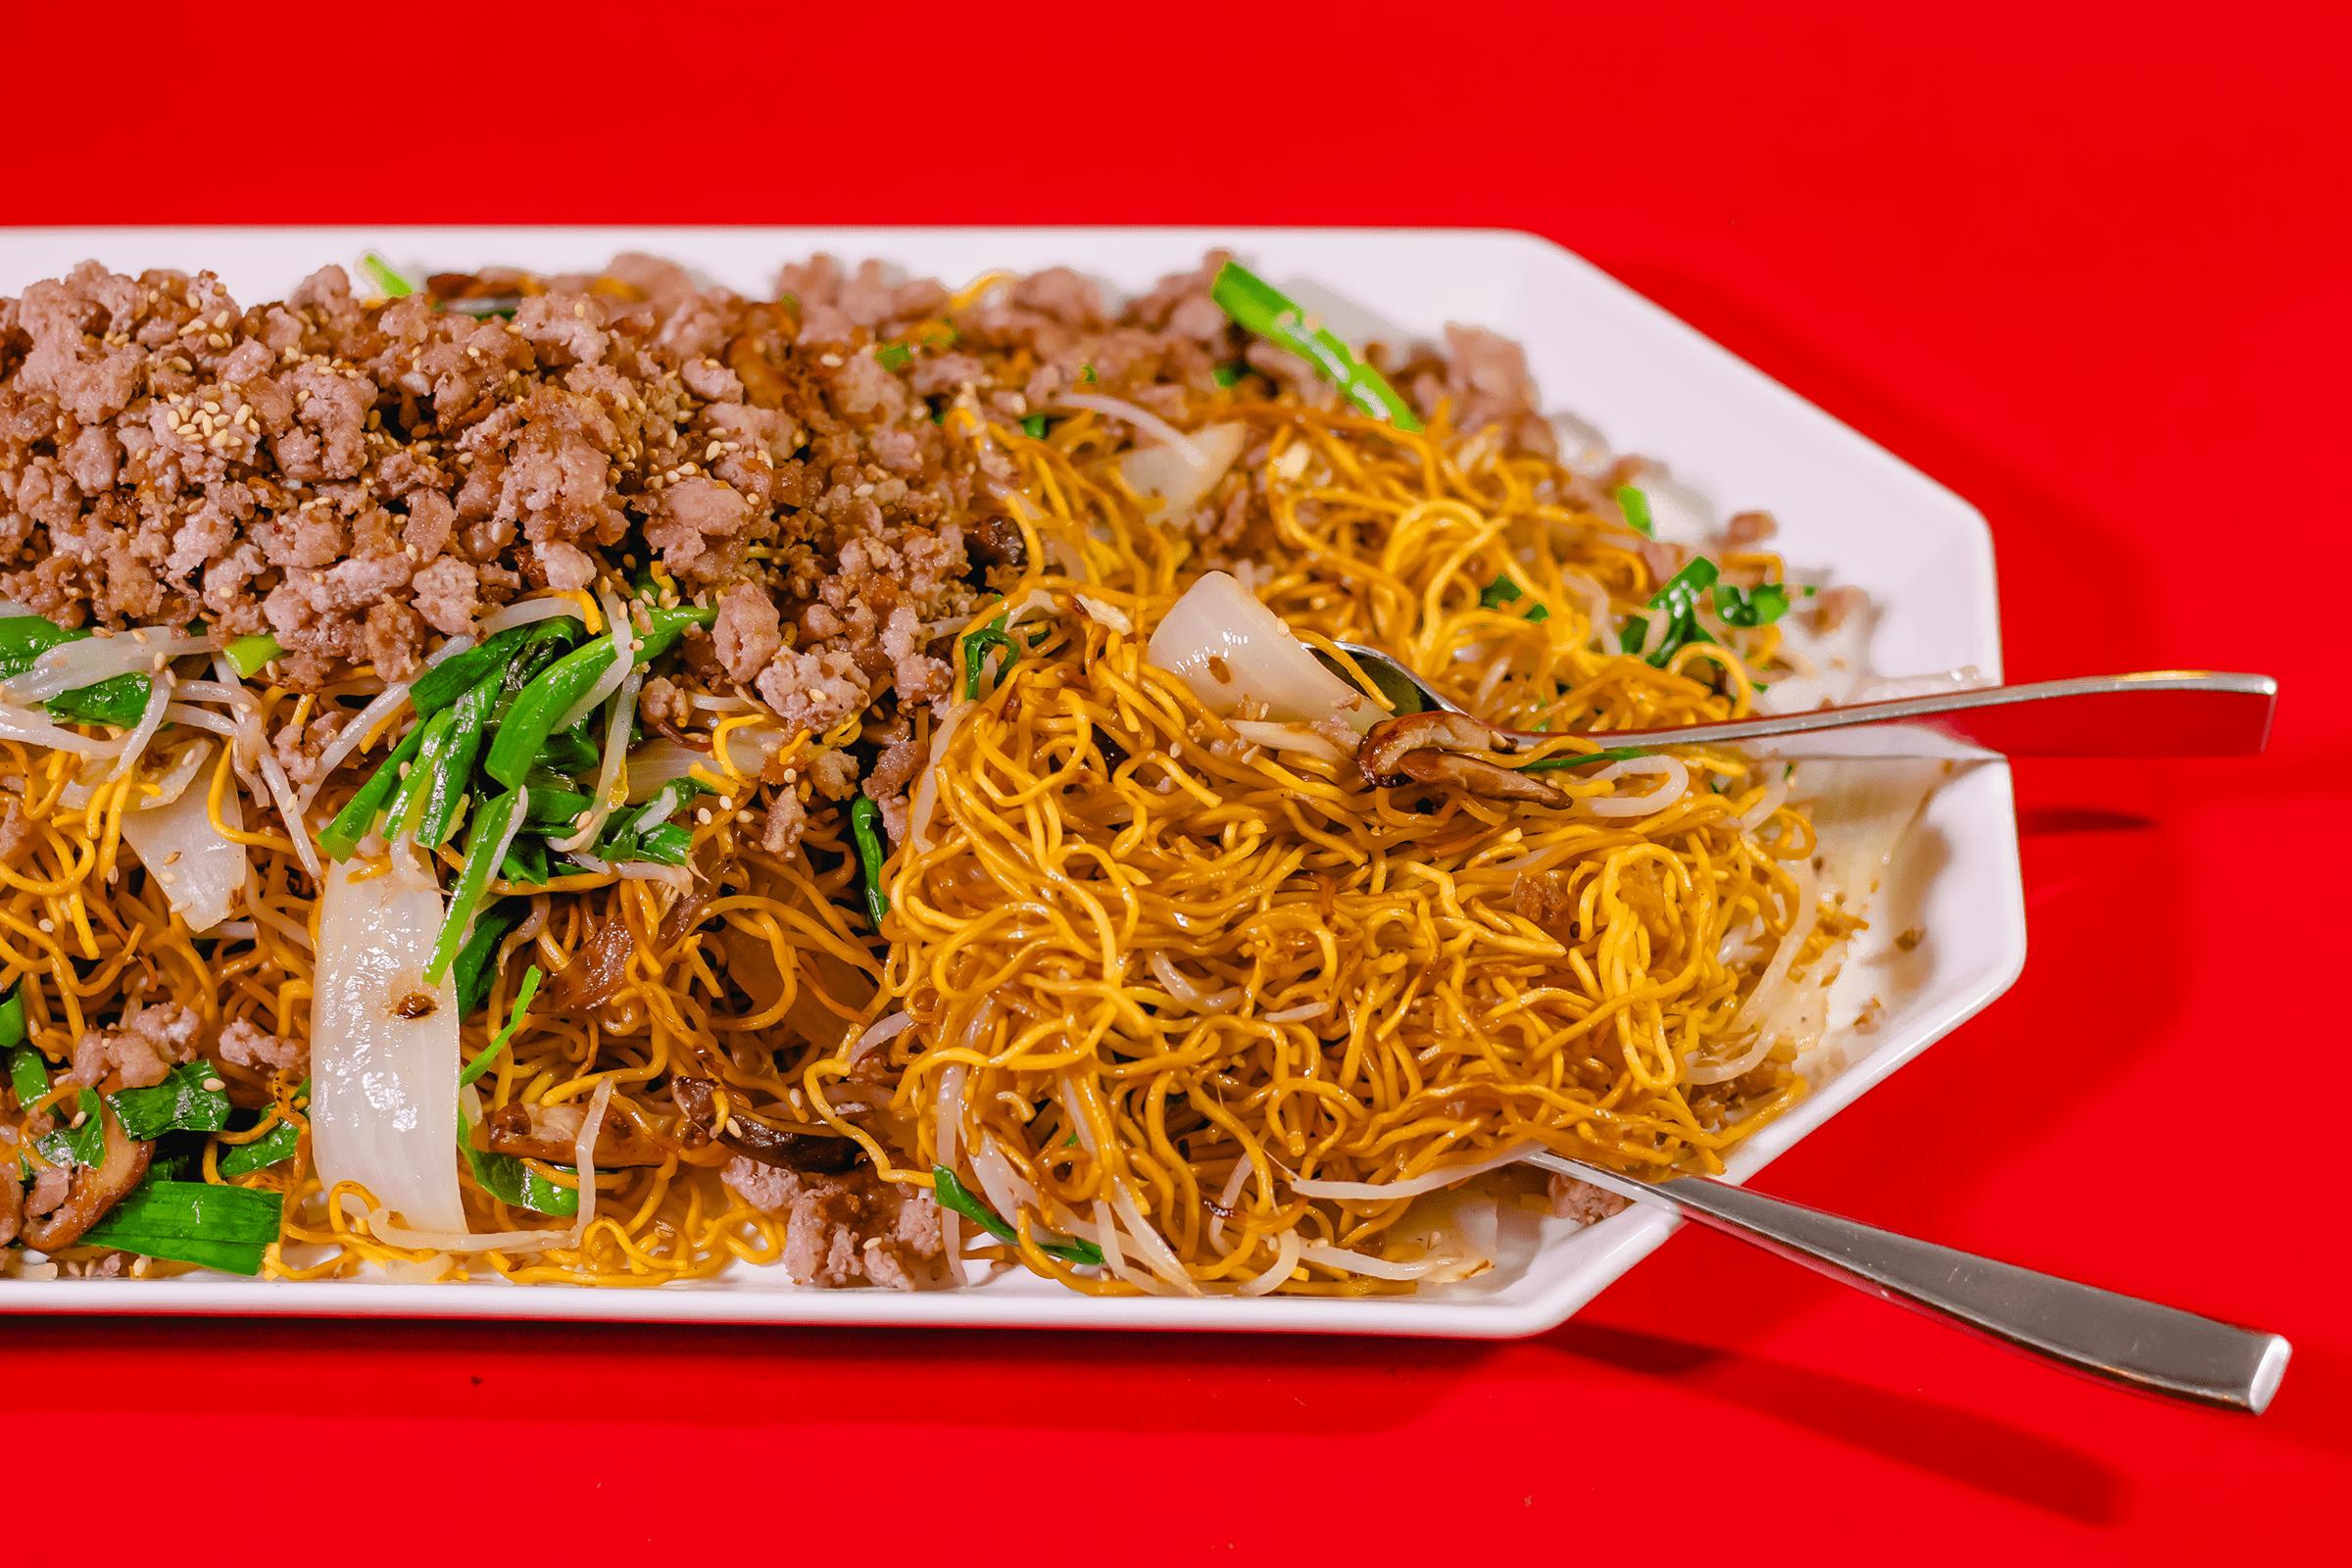 Chinese Pan Fried Noodle With Pork Kiyafries